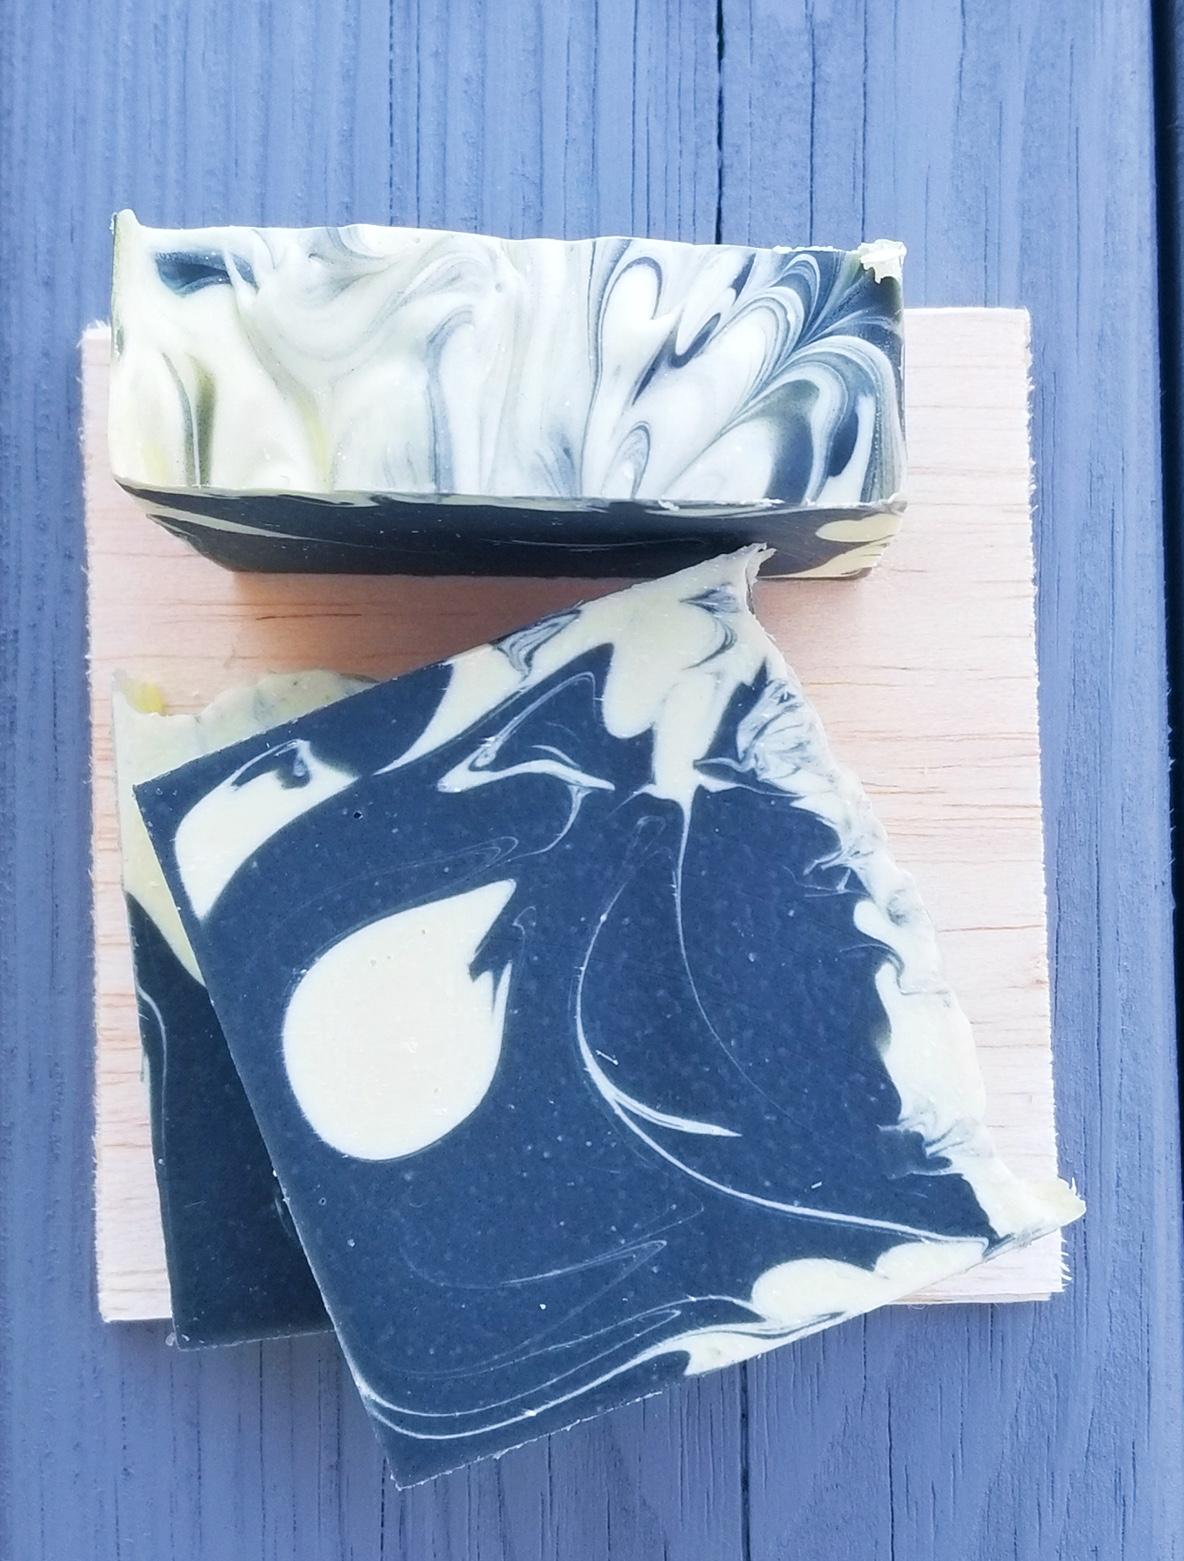 Charcoal and Lemongrass Soap 1